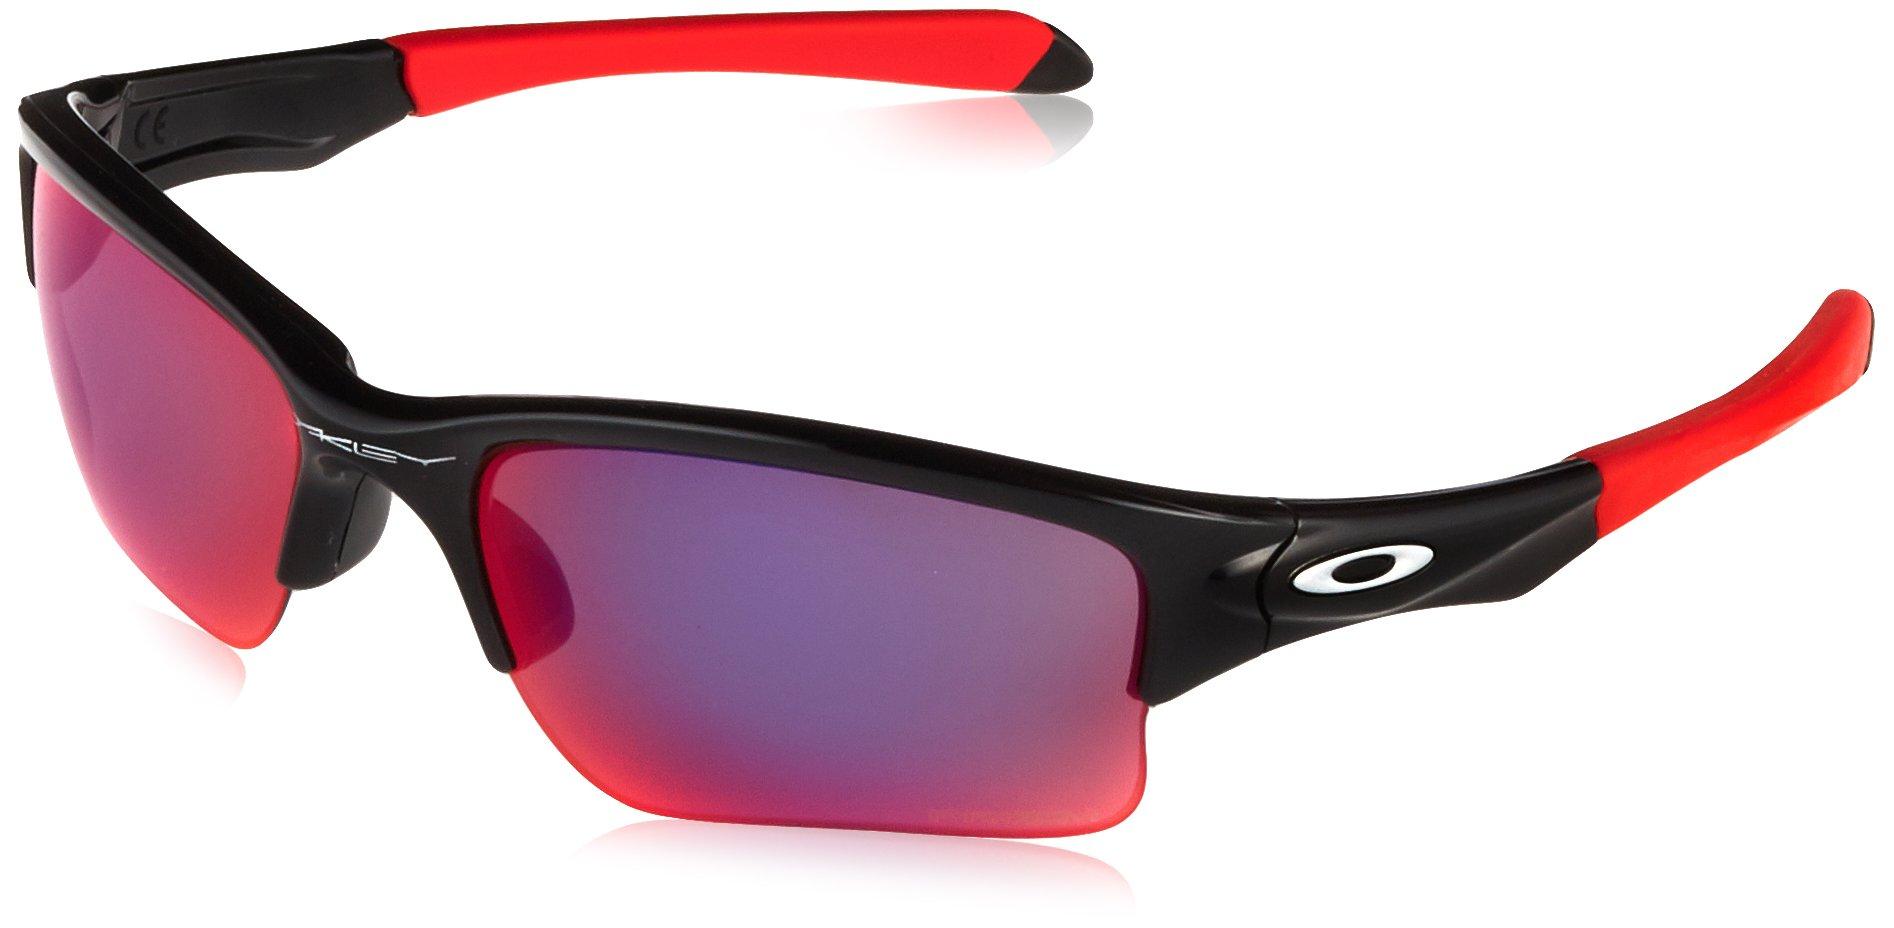 Oakley Men's OO9200 Quarter Jacket Rectangular Sunglasses, Polished Black/Prizm Road, 61 mm by Oakley